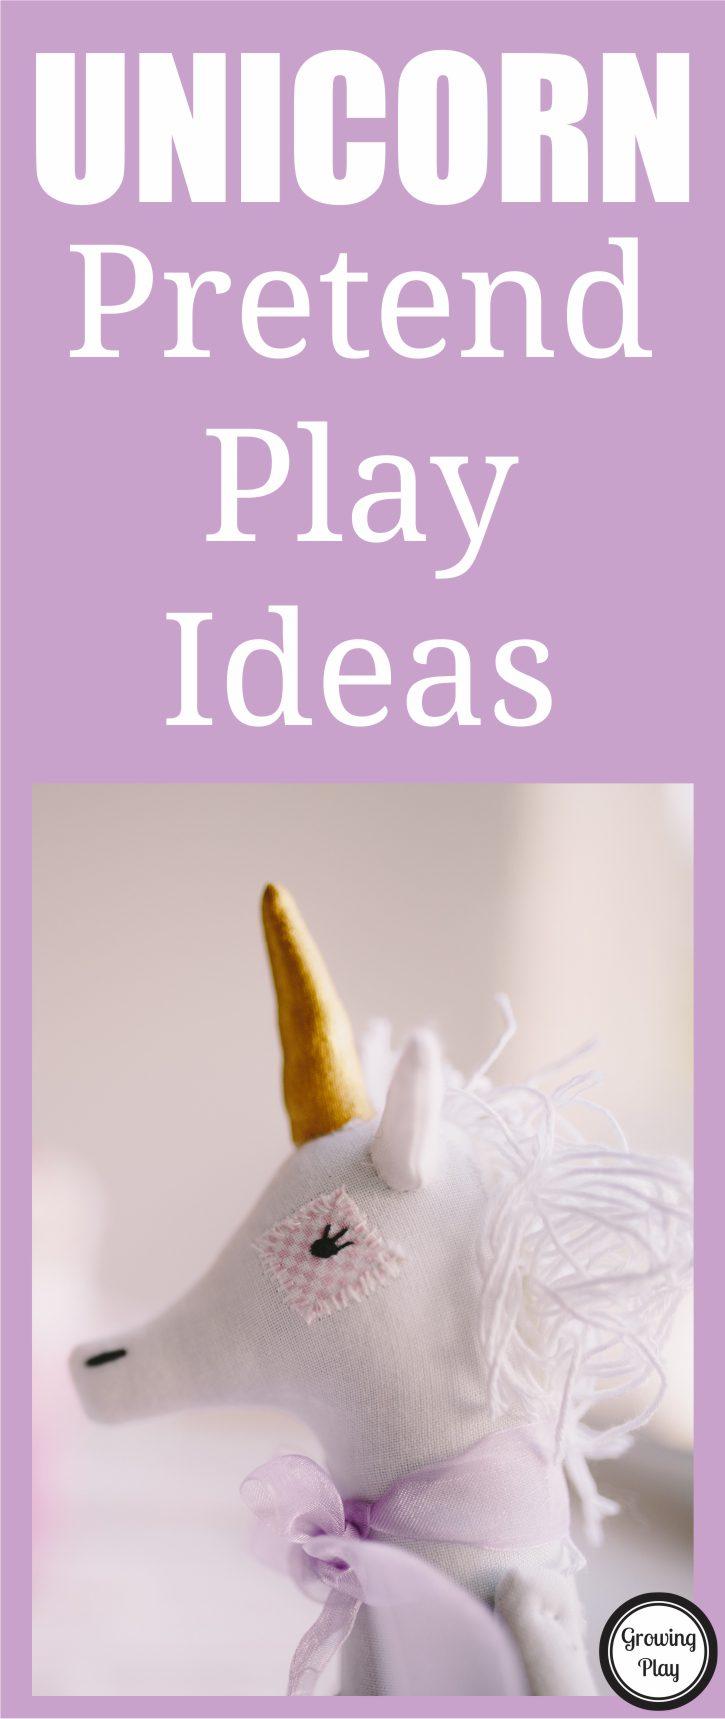 Unicorn Pretend Play Ideas - Growing Play